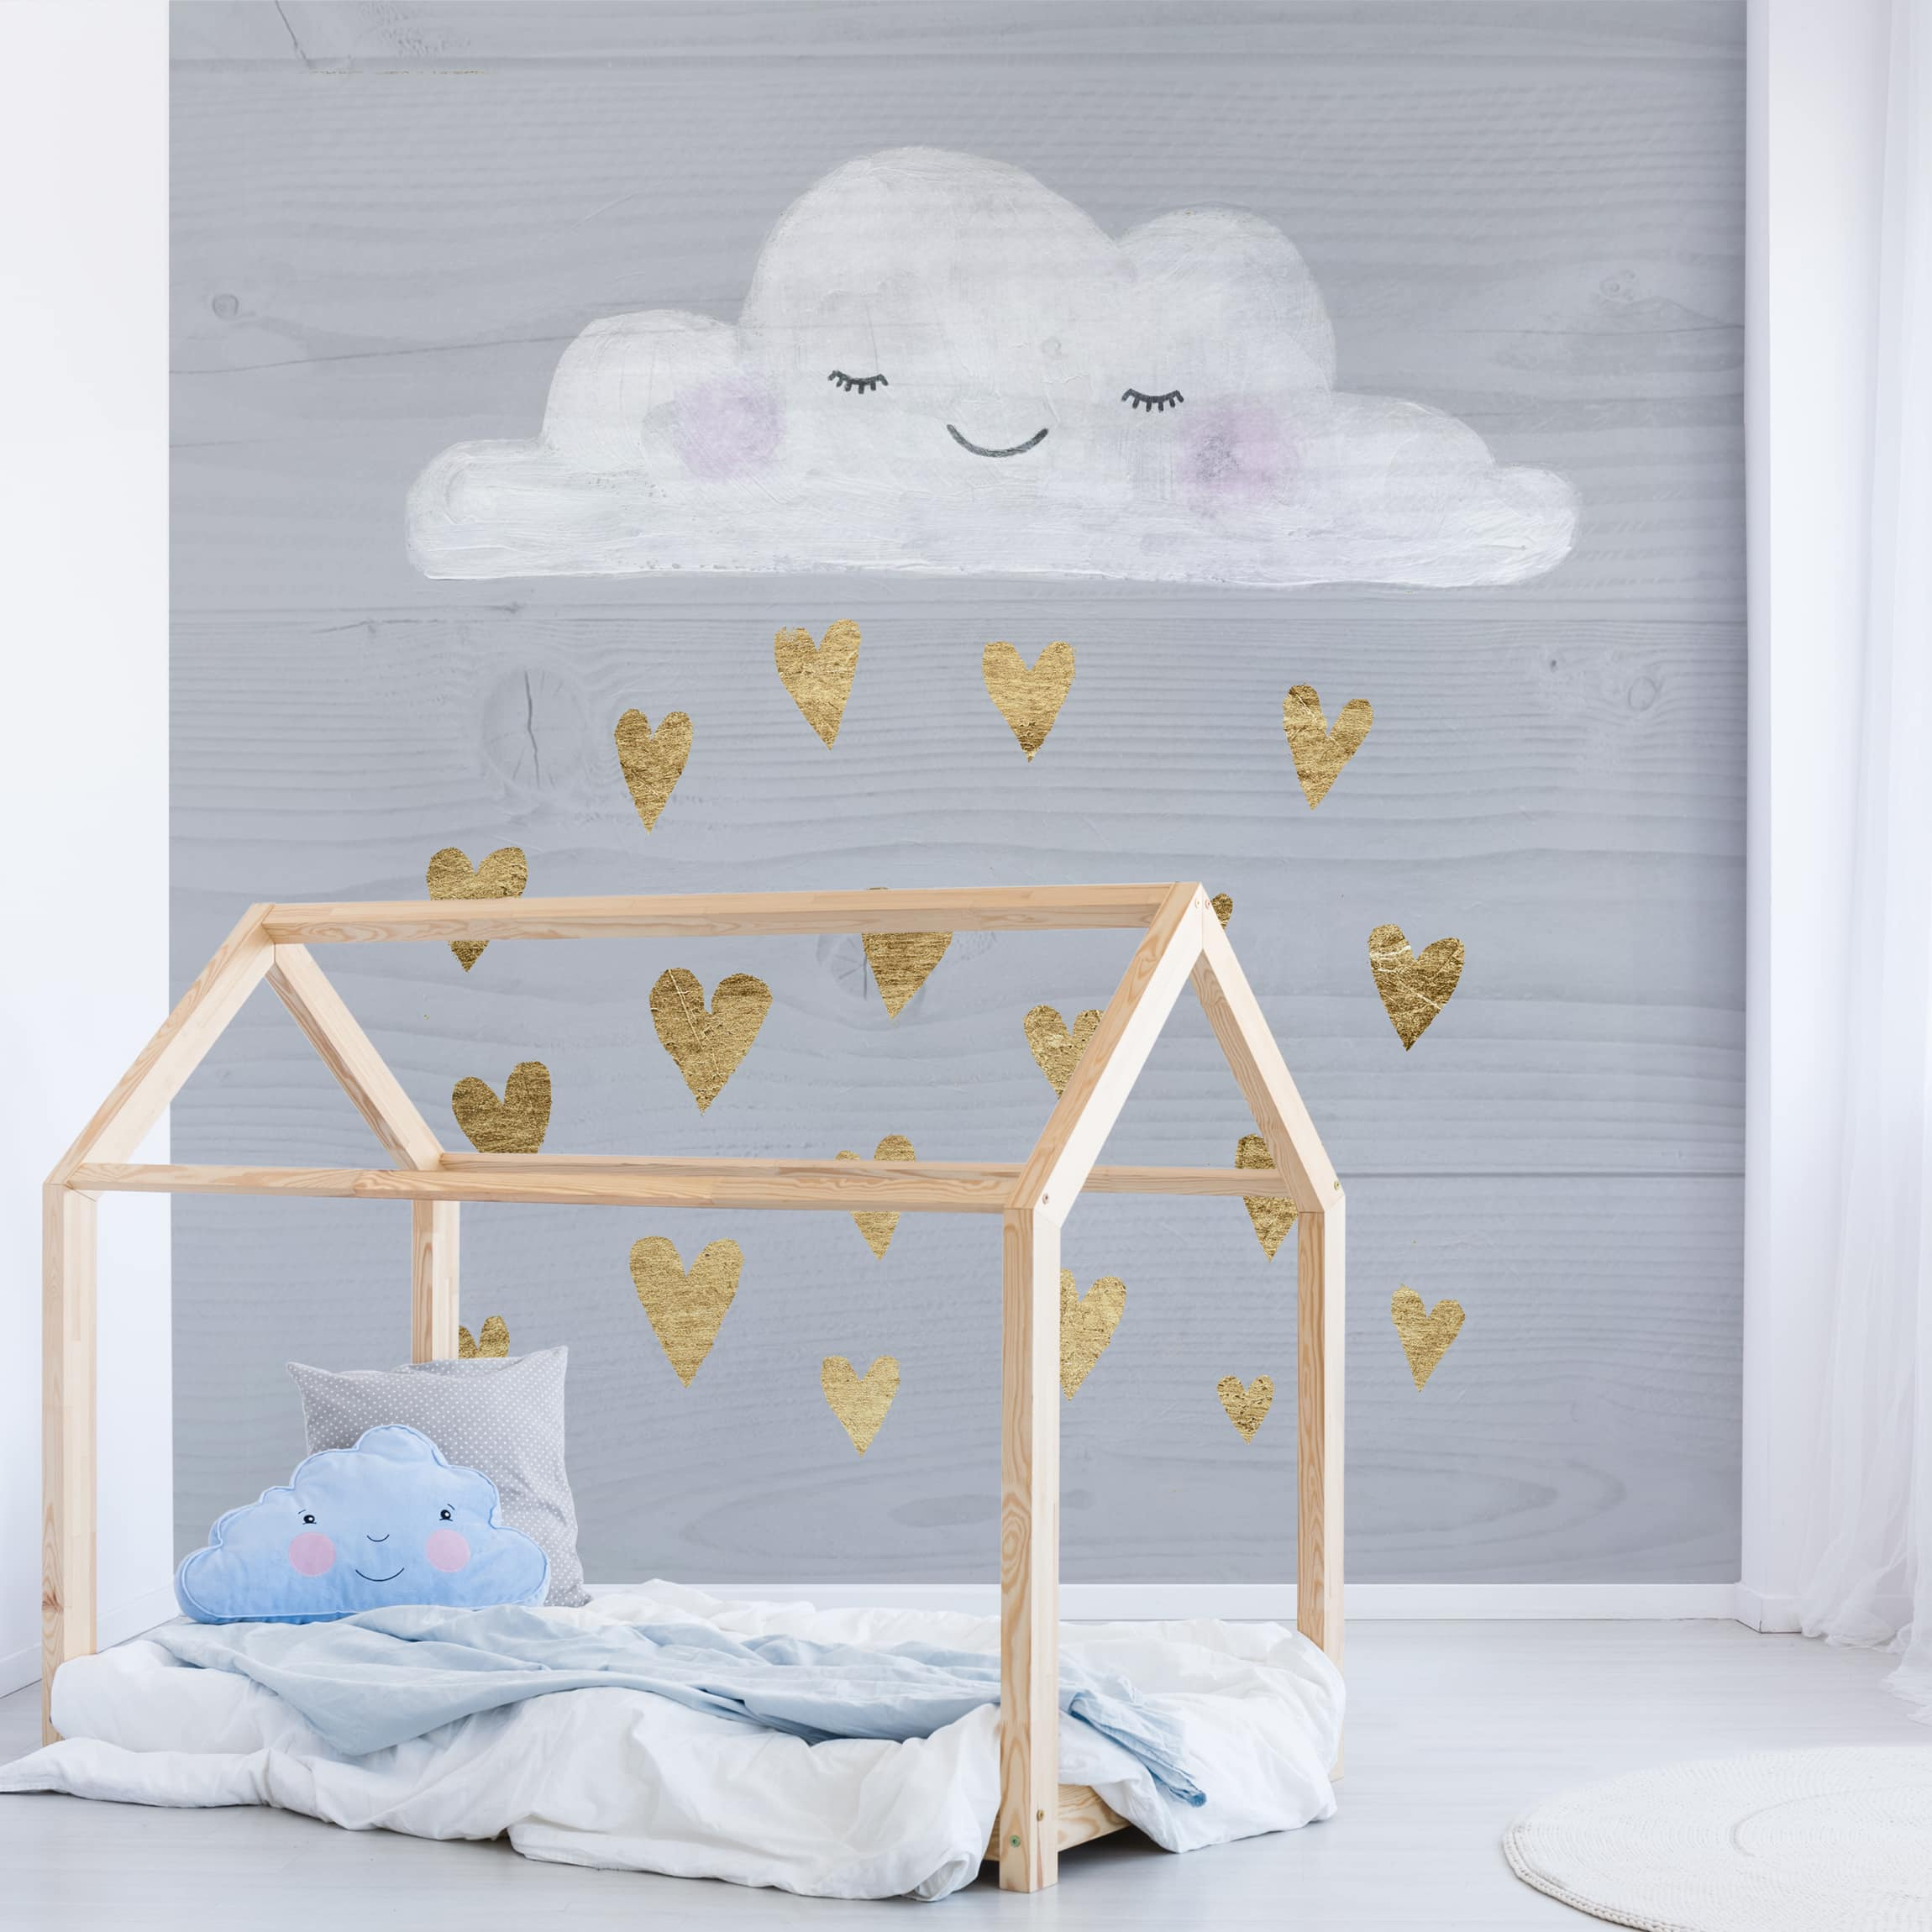 Selbstklebende Tapete Kinderzimmer Wolke Mit Goldenen Herzen Fototapete Quadrat